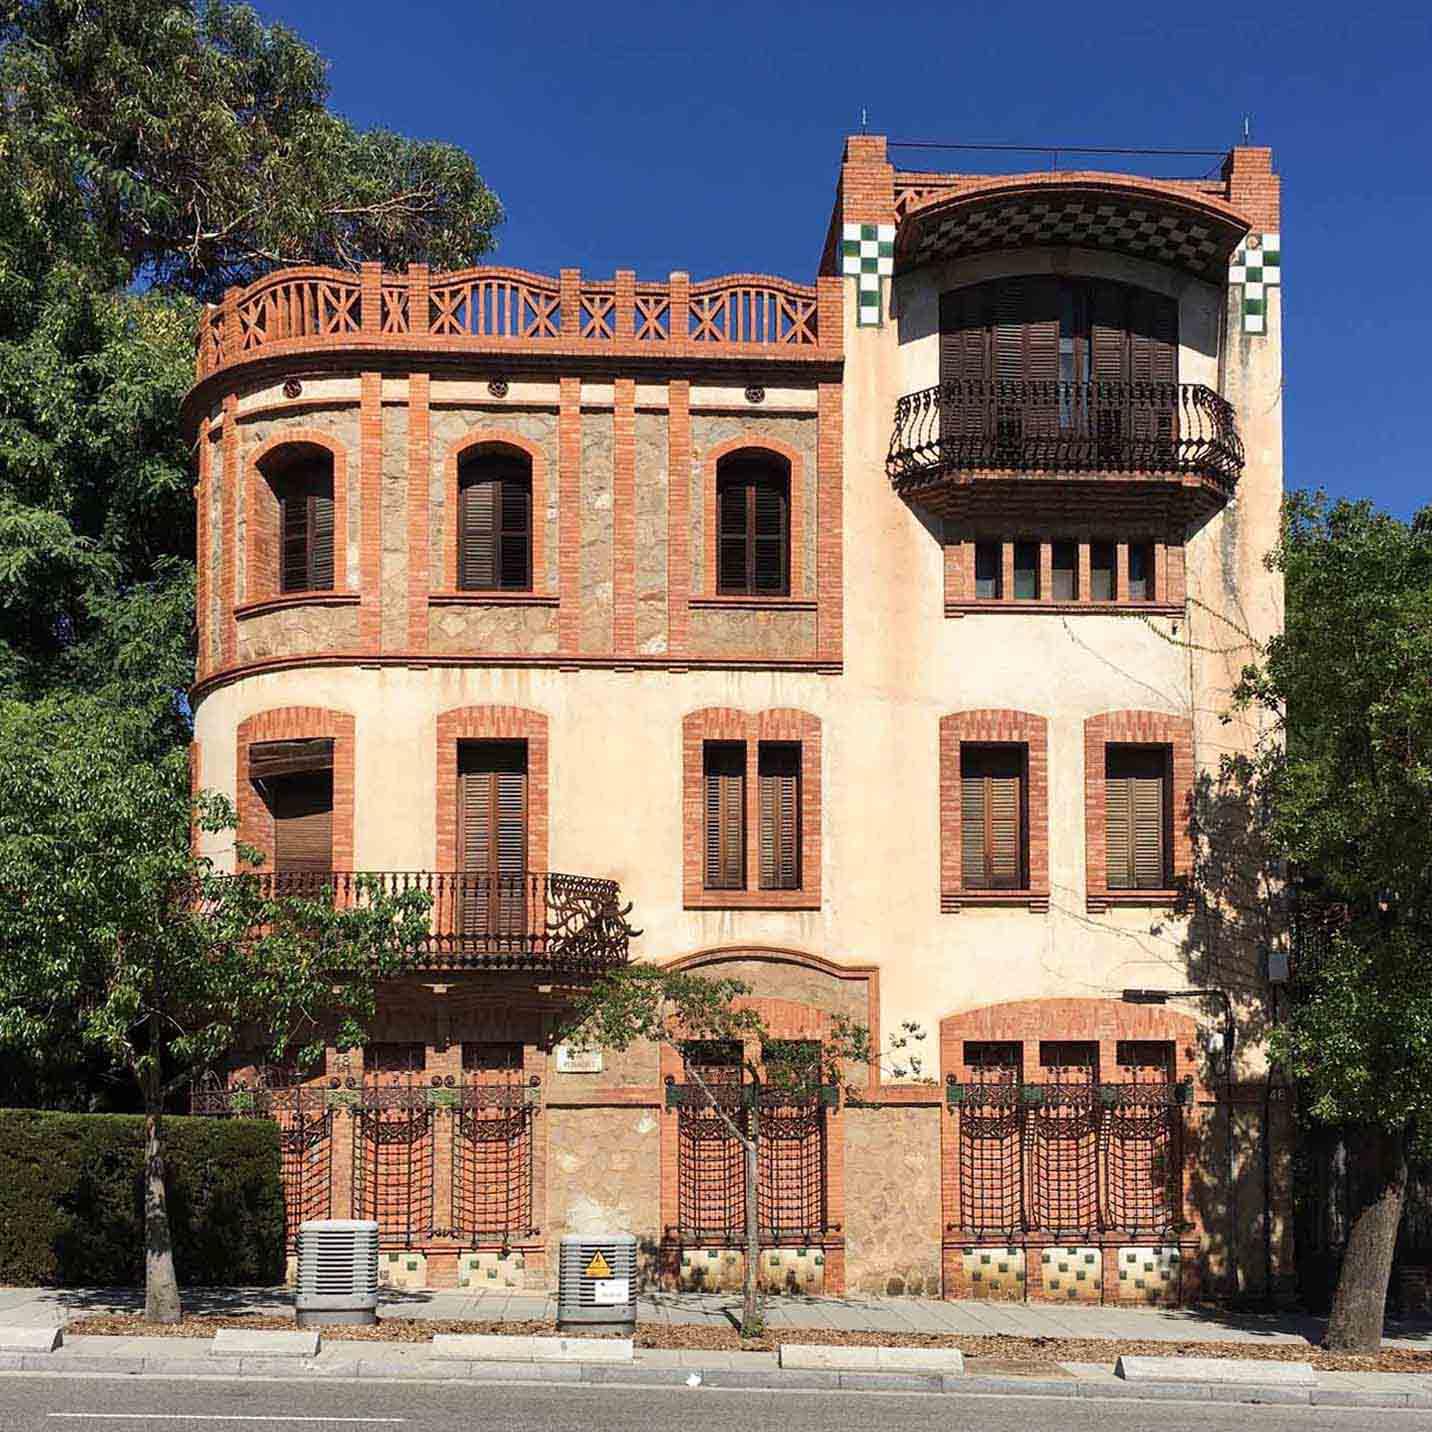 Barcelona_photographer_architecture_instagram_iphone_IMG_5303